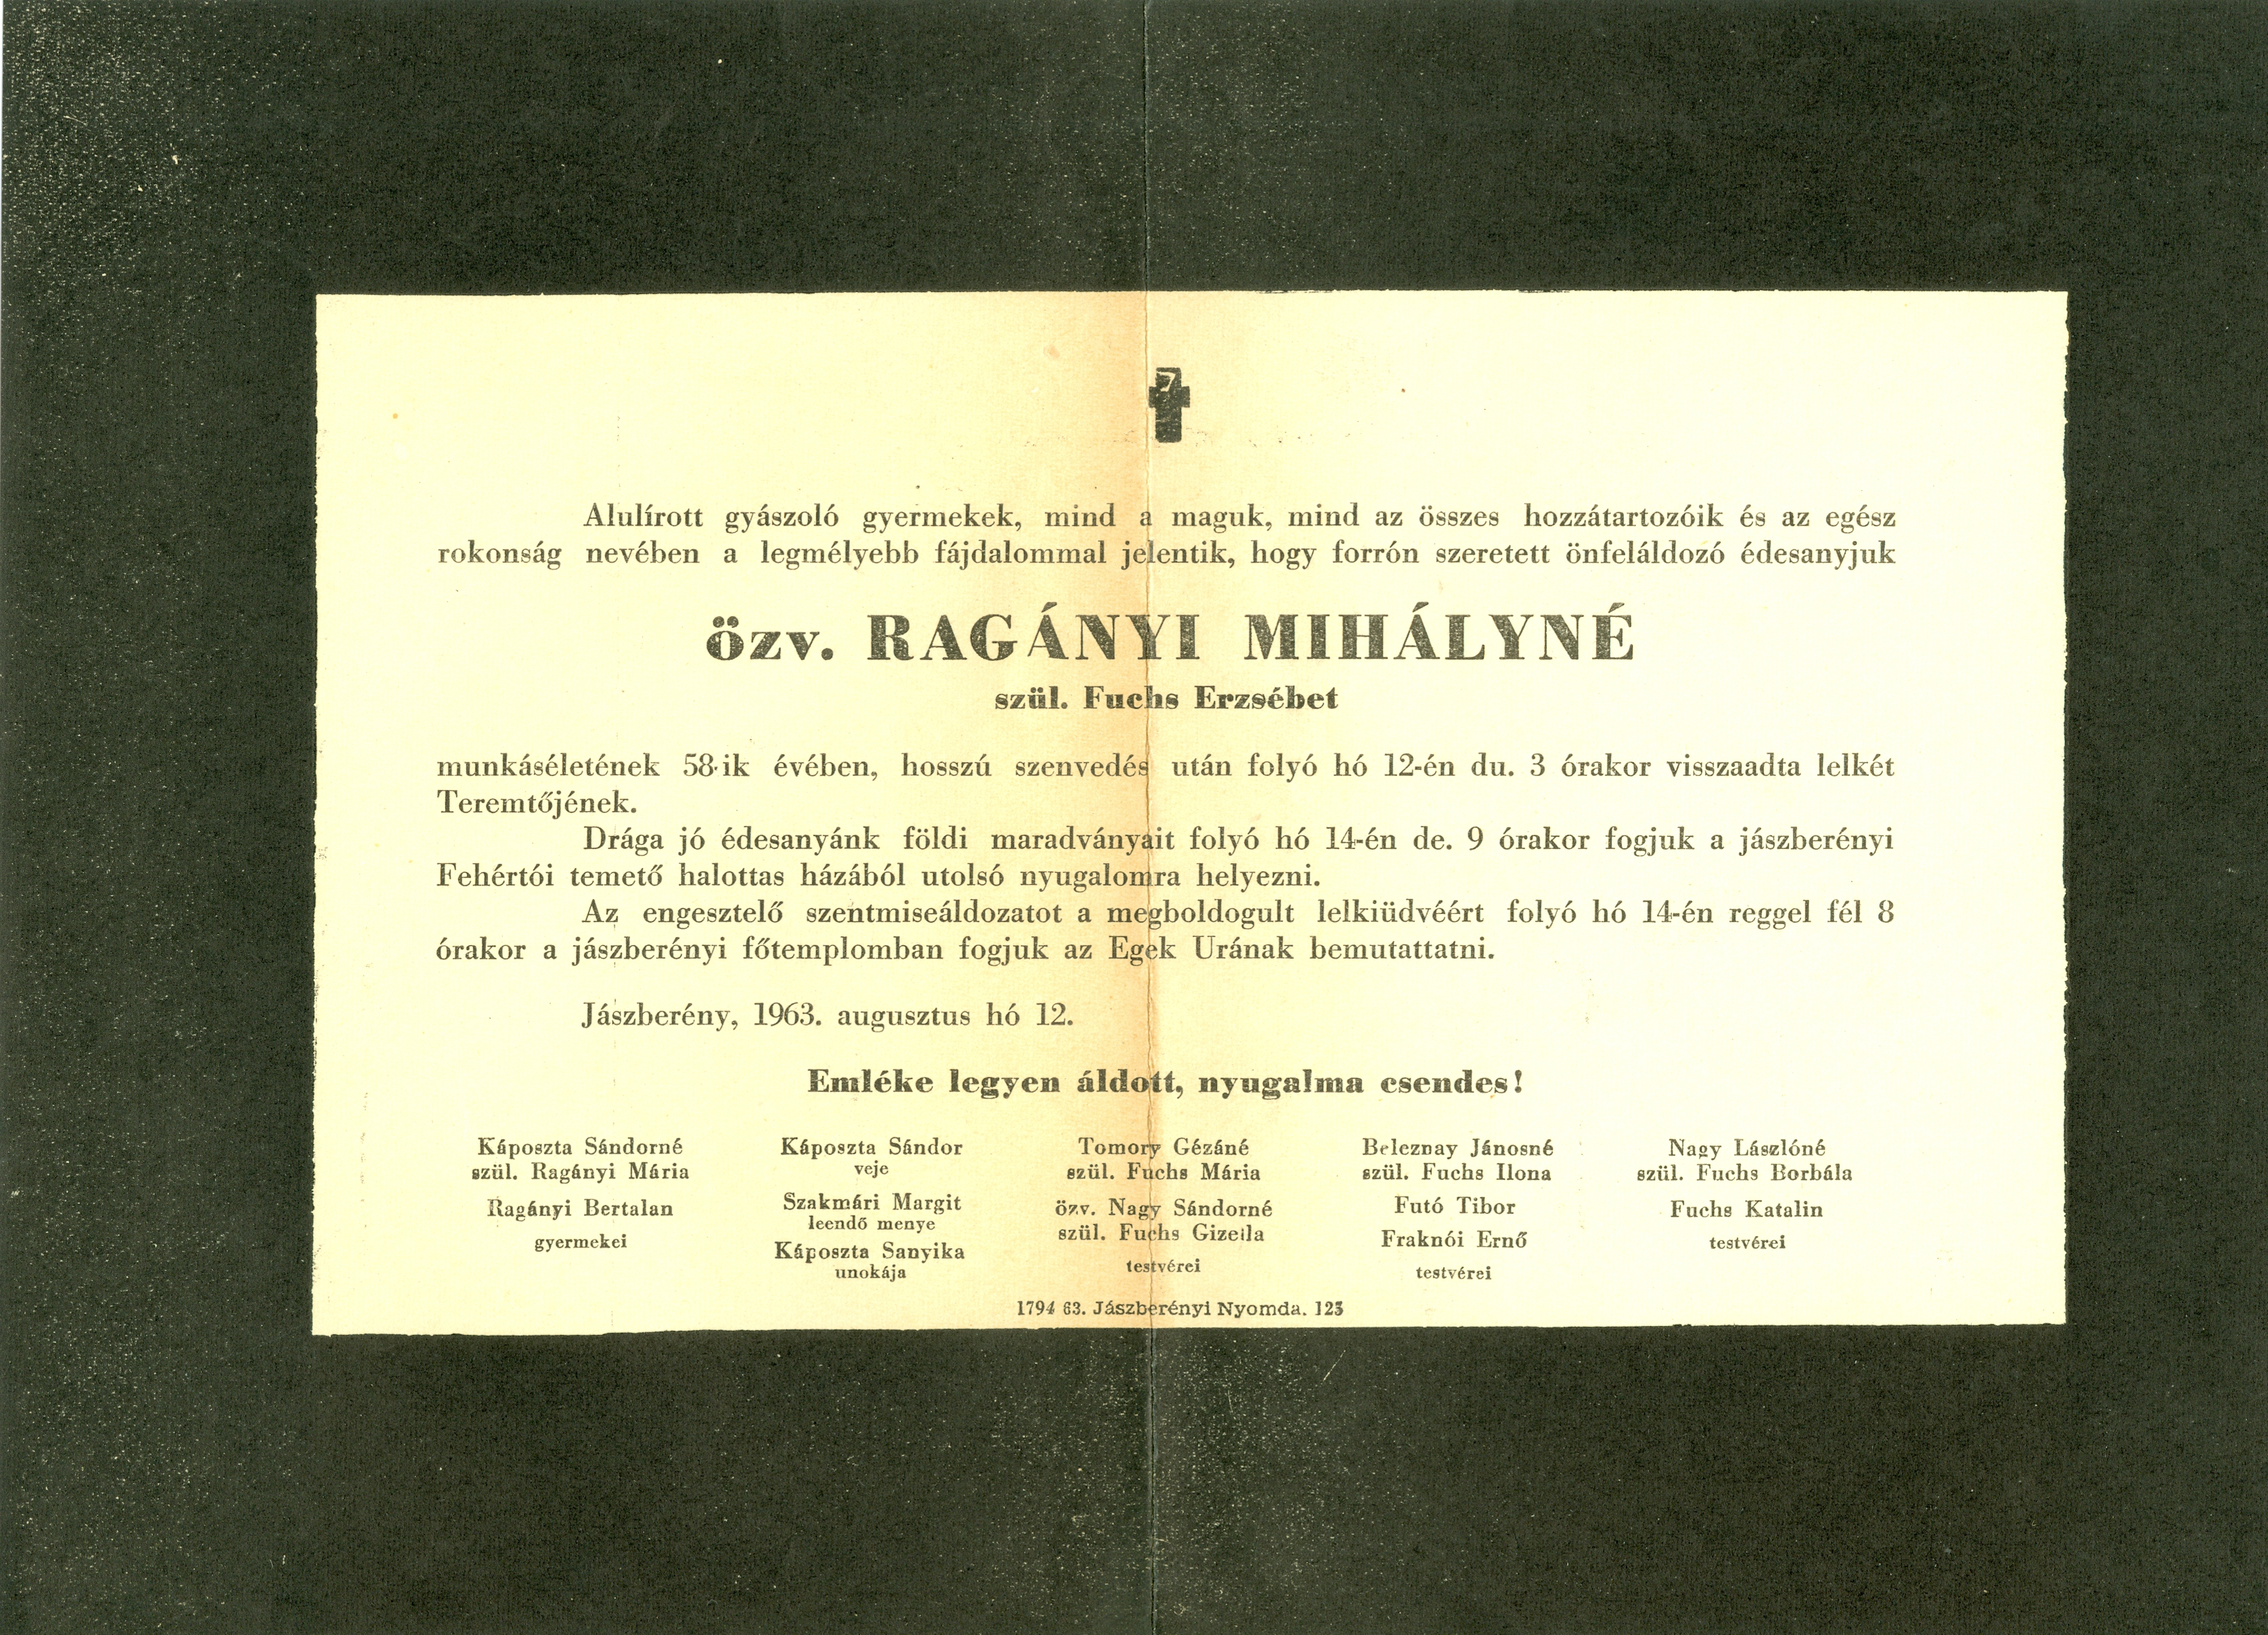 Ragányi Mihályné